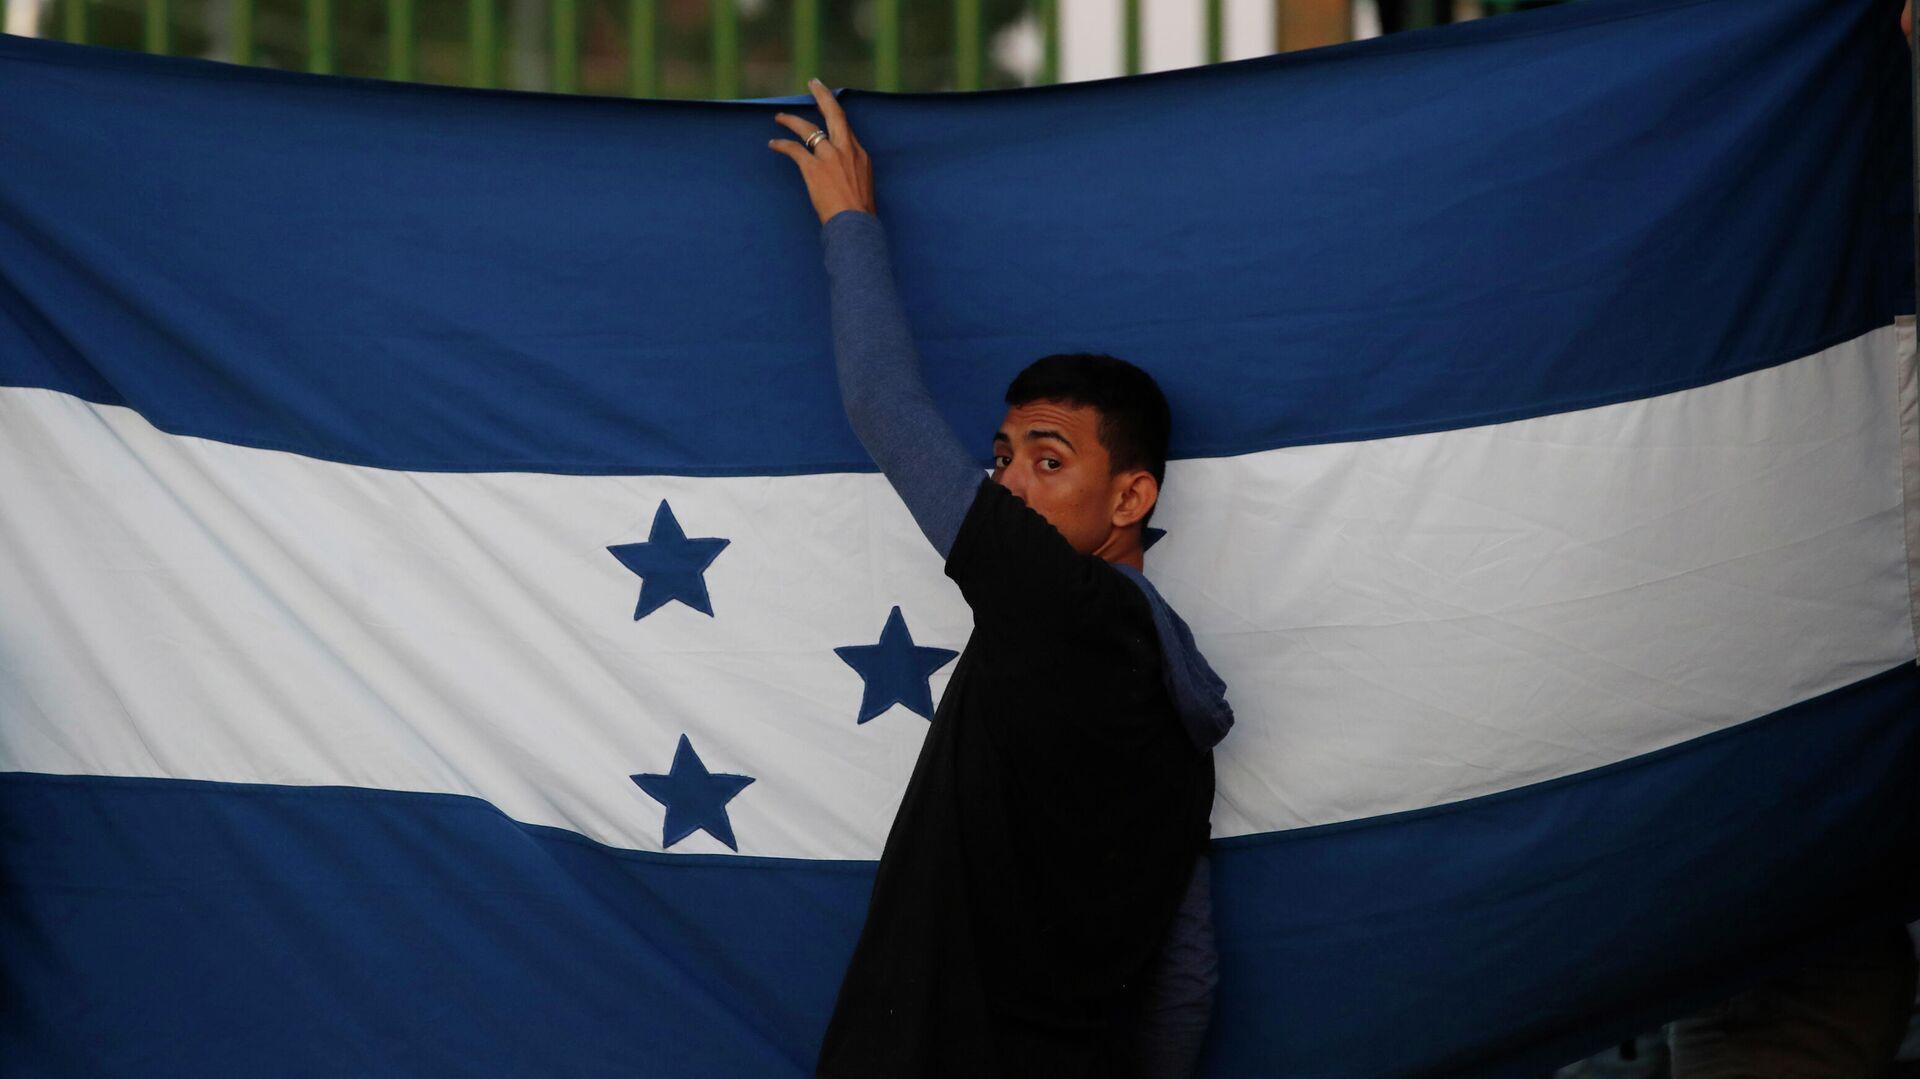 Bandera de Honduras - Sputnik Mundo, 1920, 25.05.2021